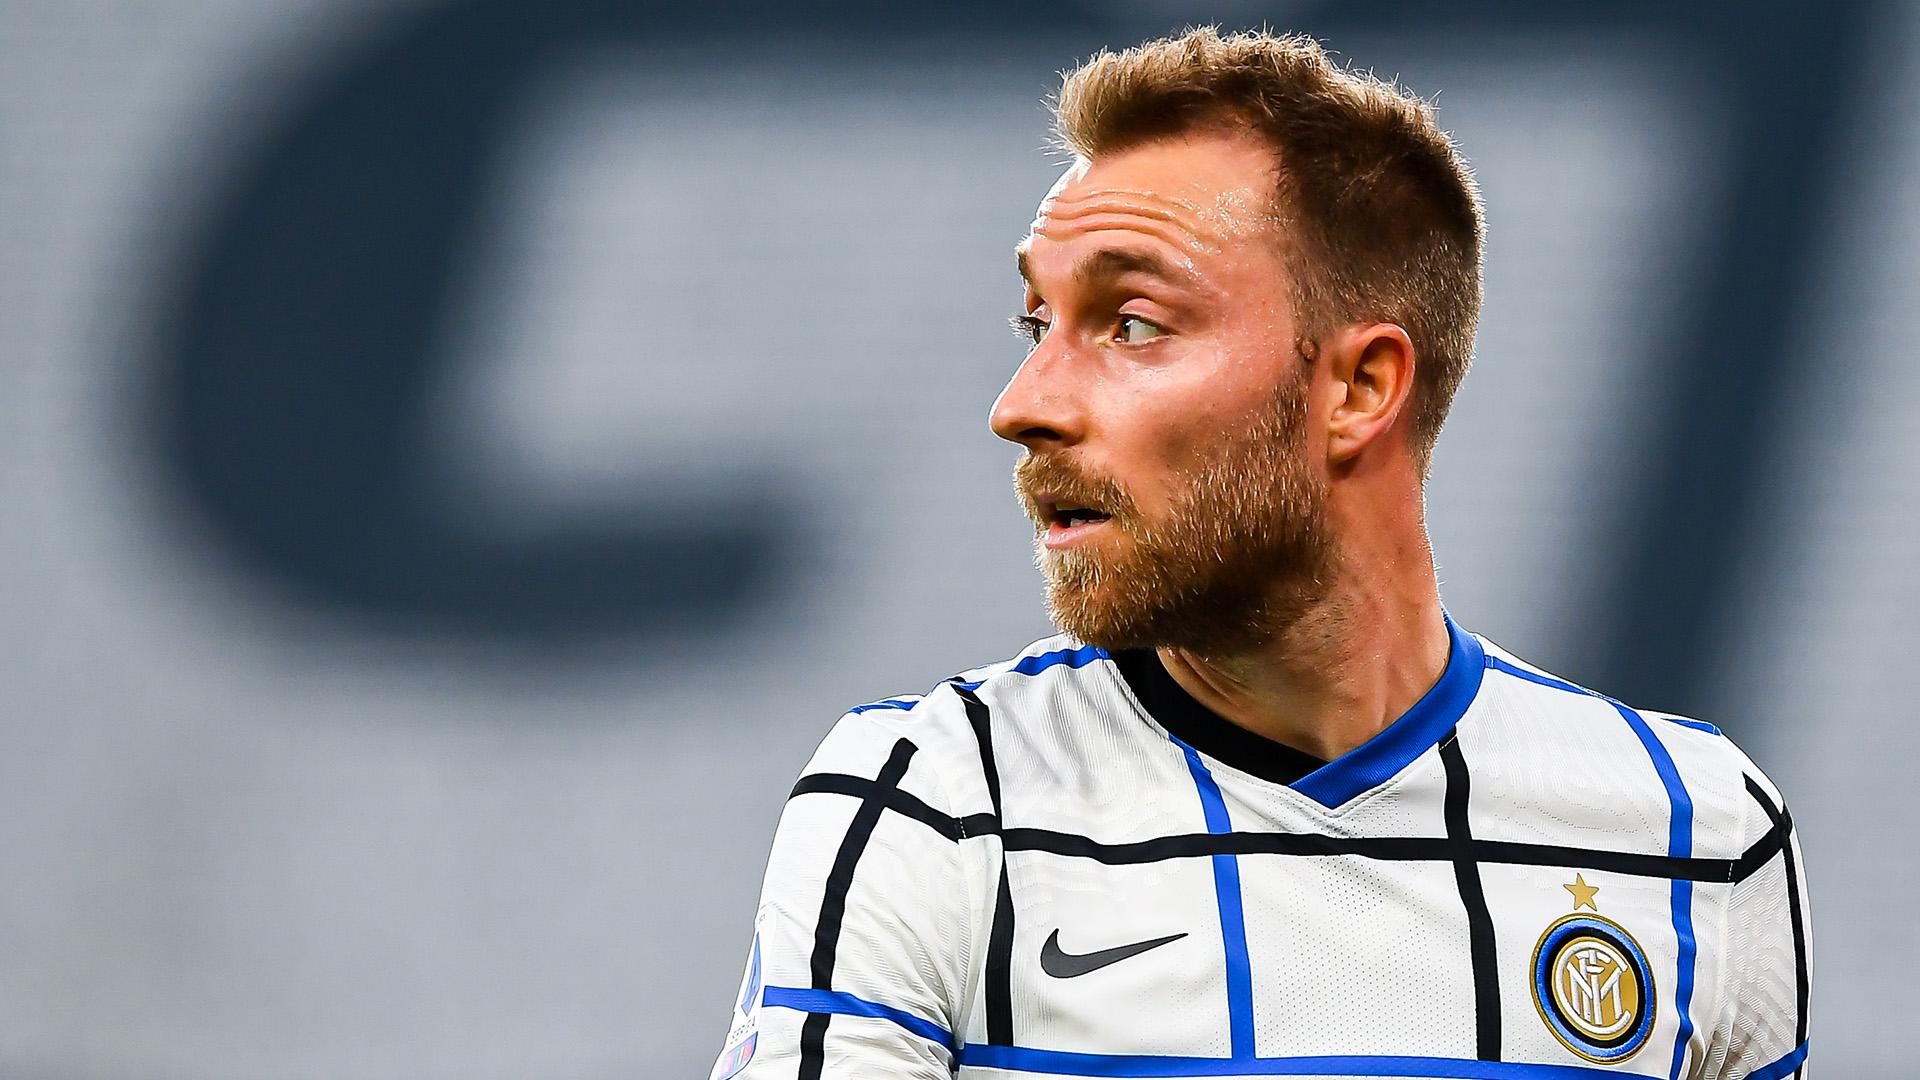 Eriksen 'far, far too good' for bench role - Denmark NT head coach slams Inter for wasting midfielder's talent